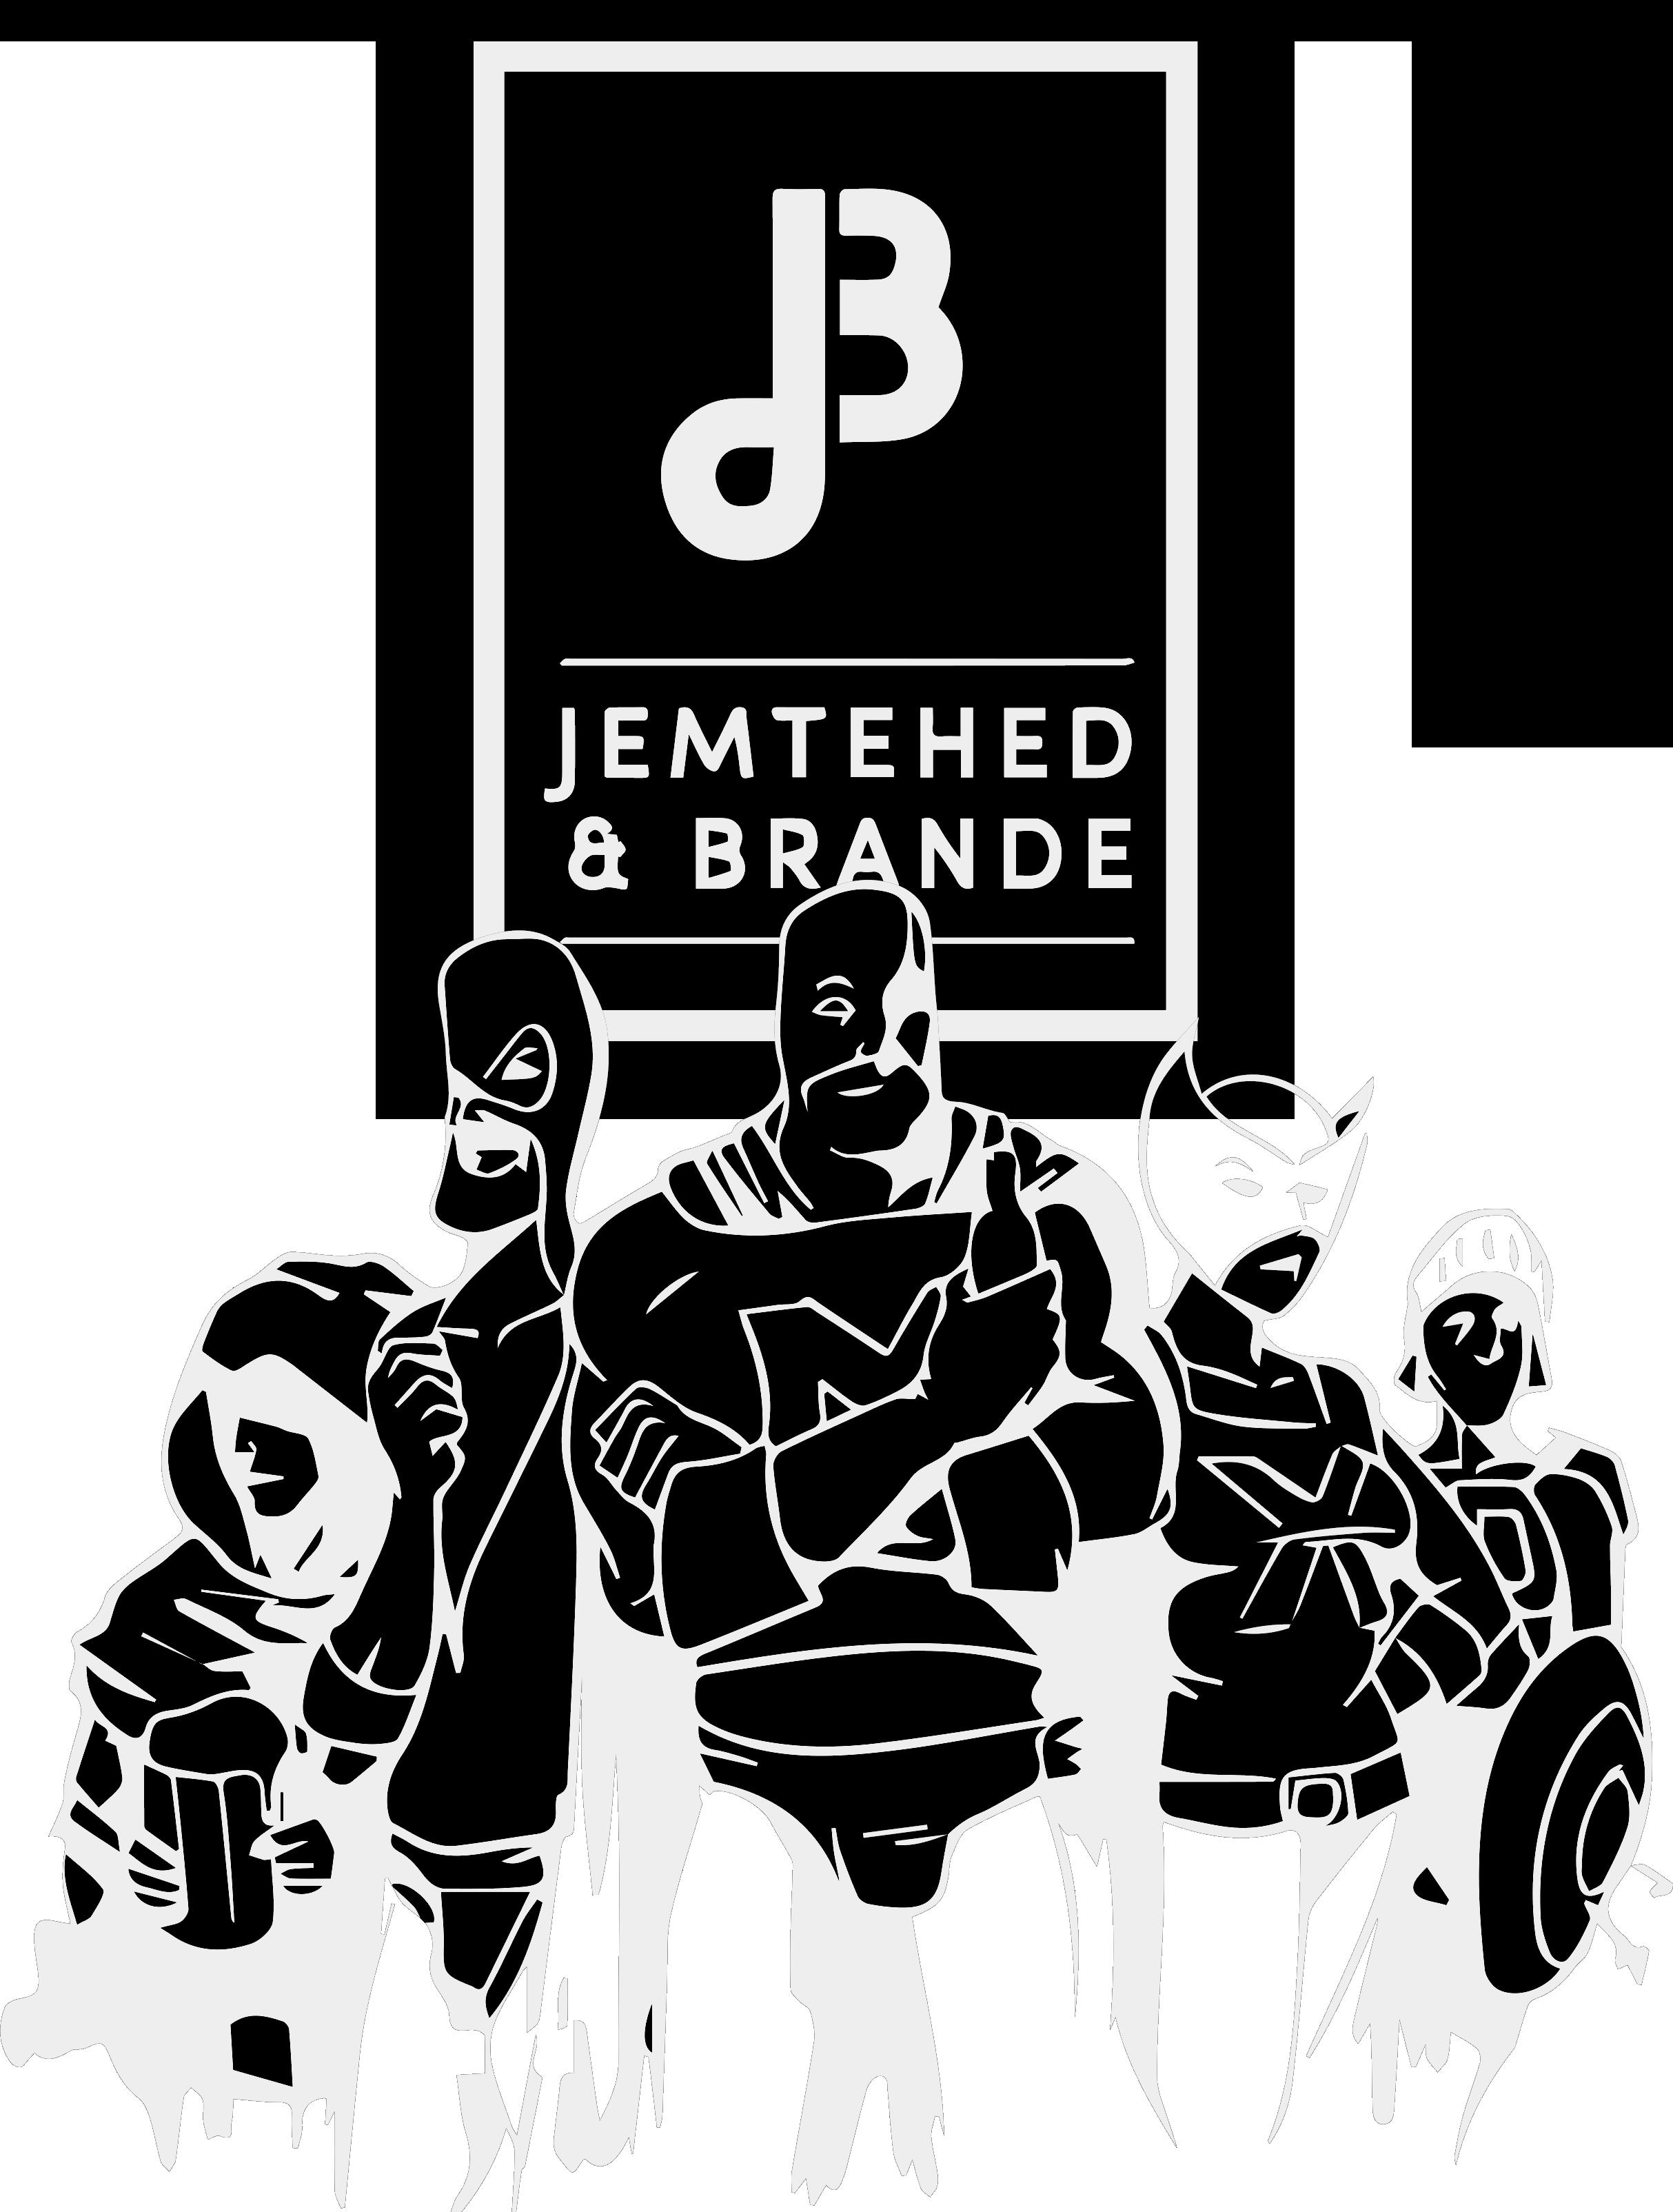 Jemtehed & Brande